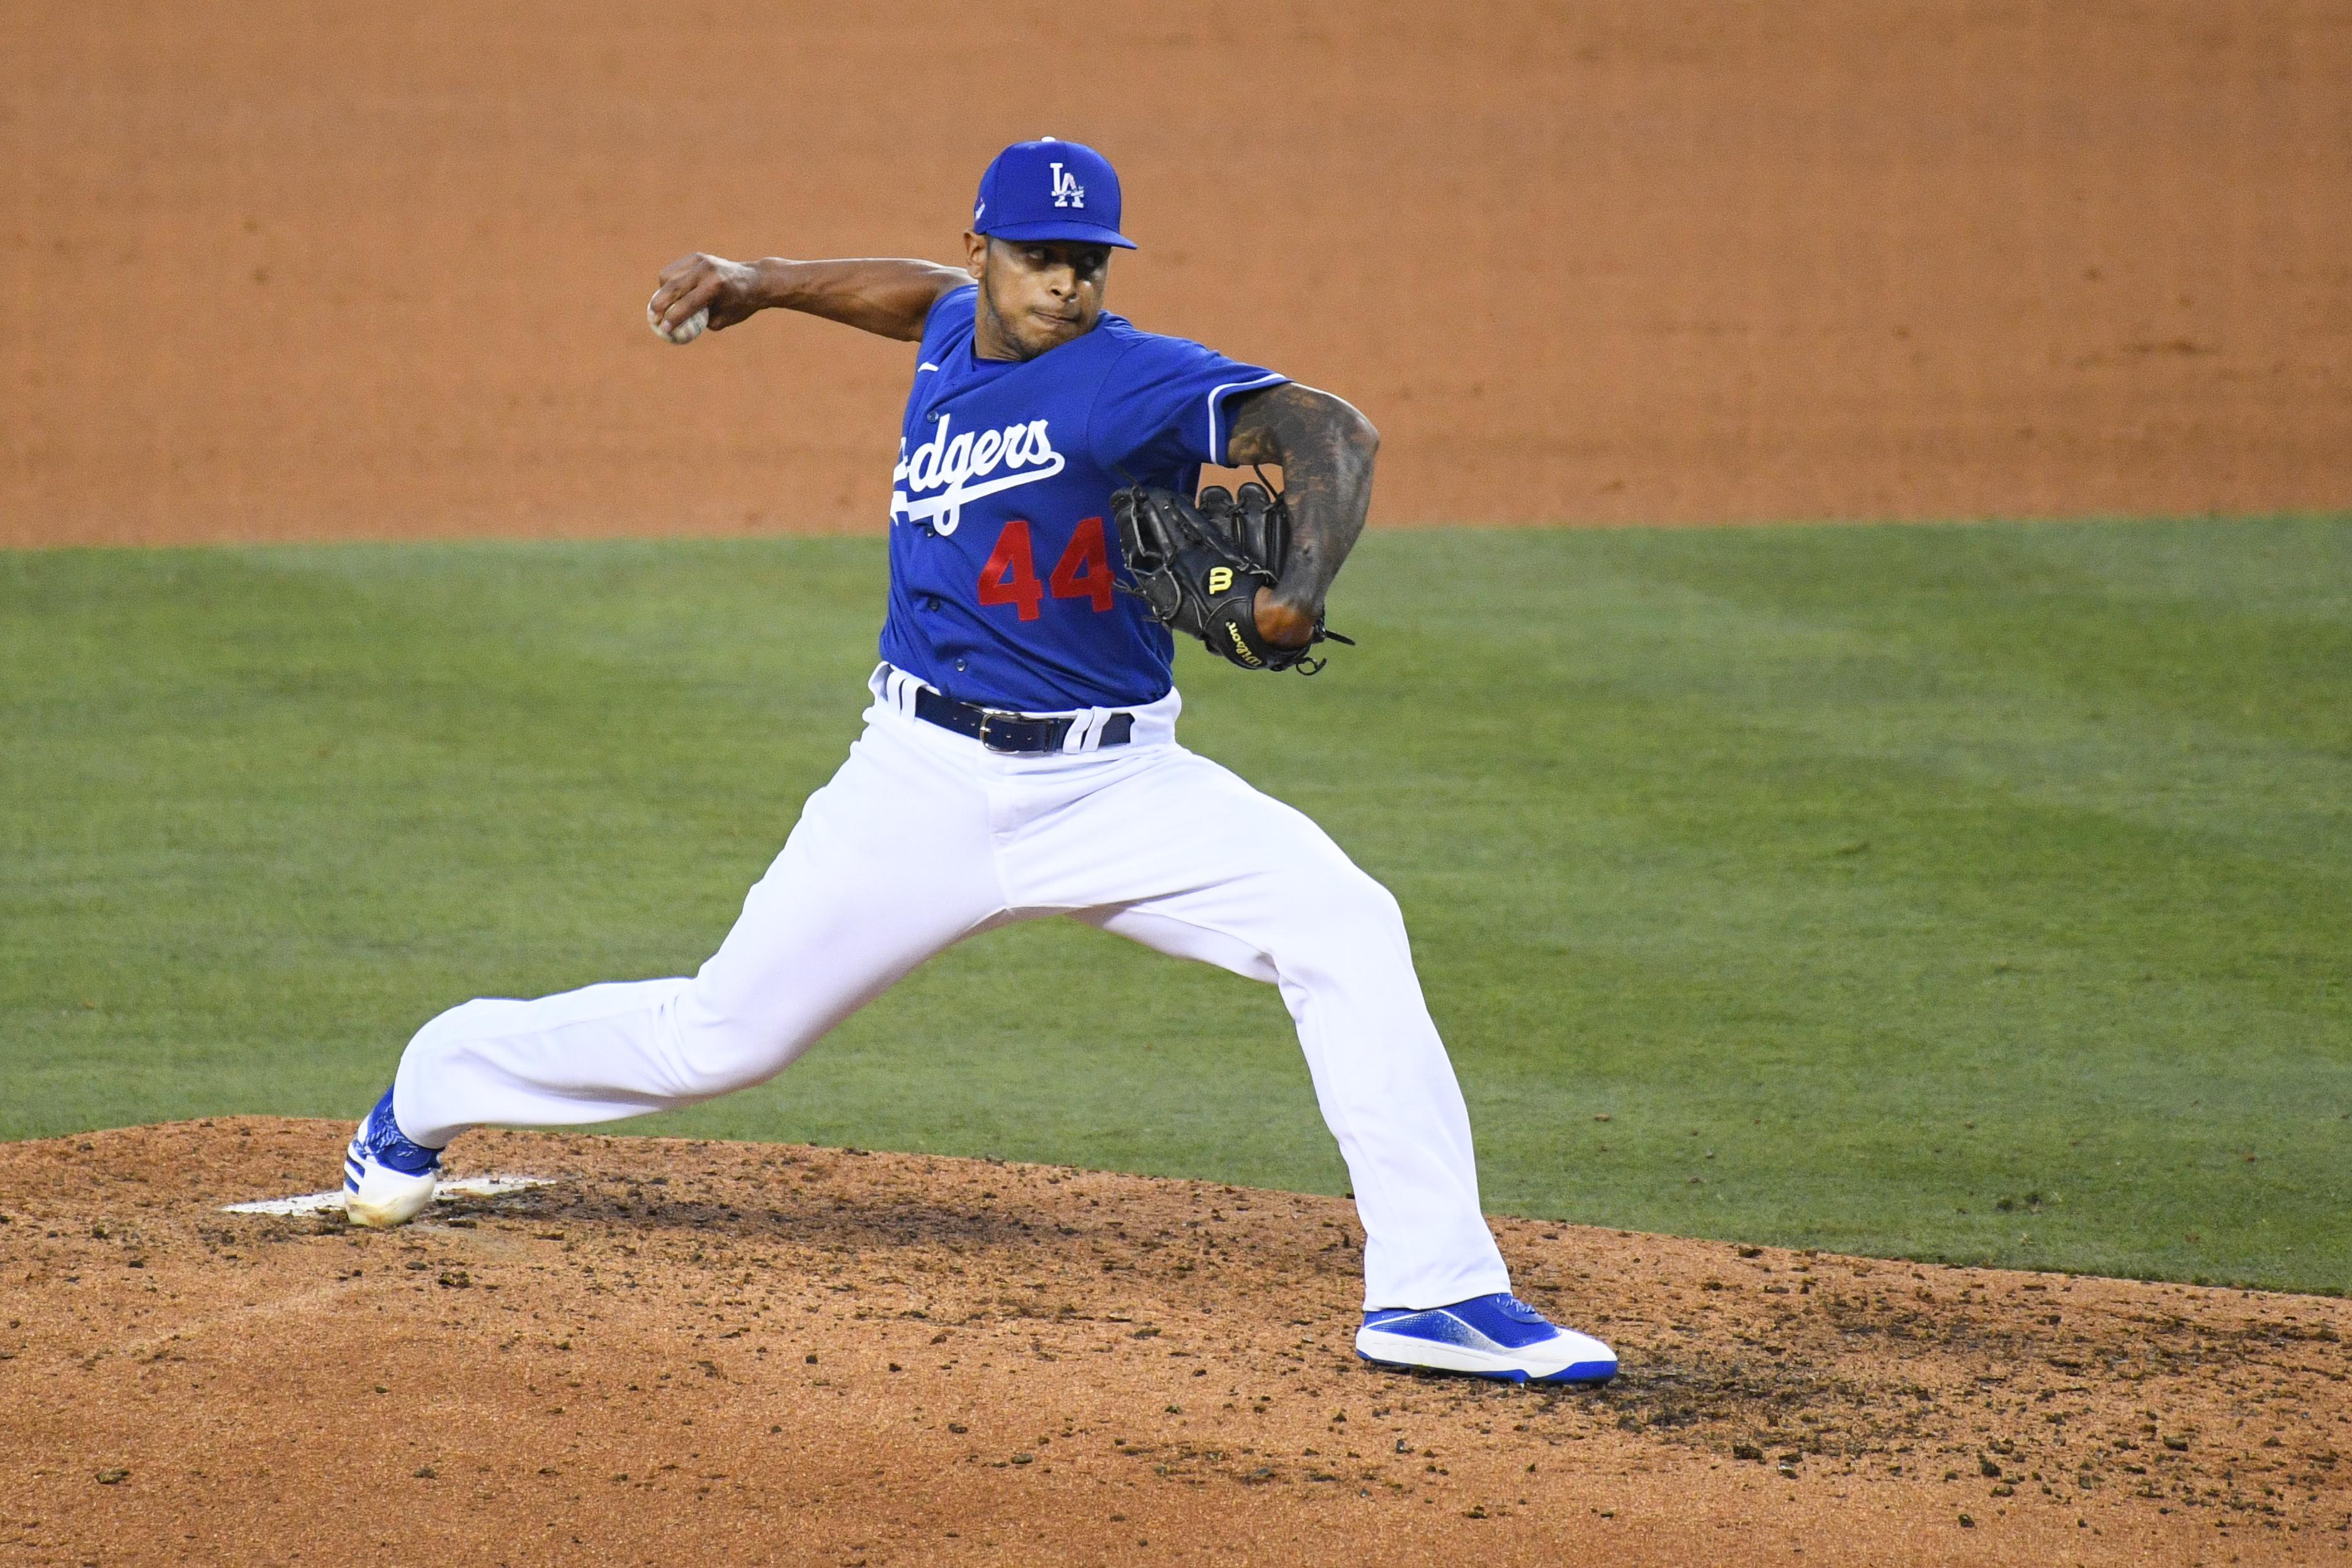 MLB: JUL 19 Diamondbacks at Dodgers